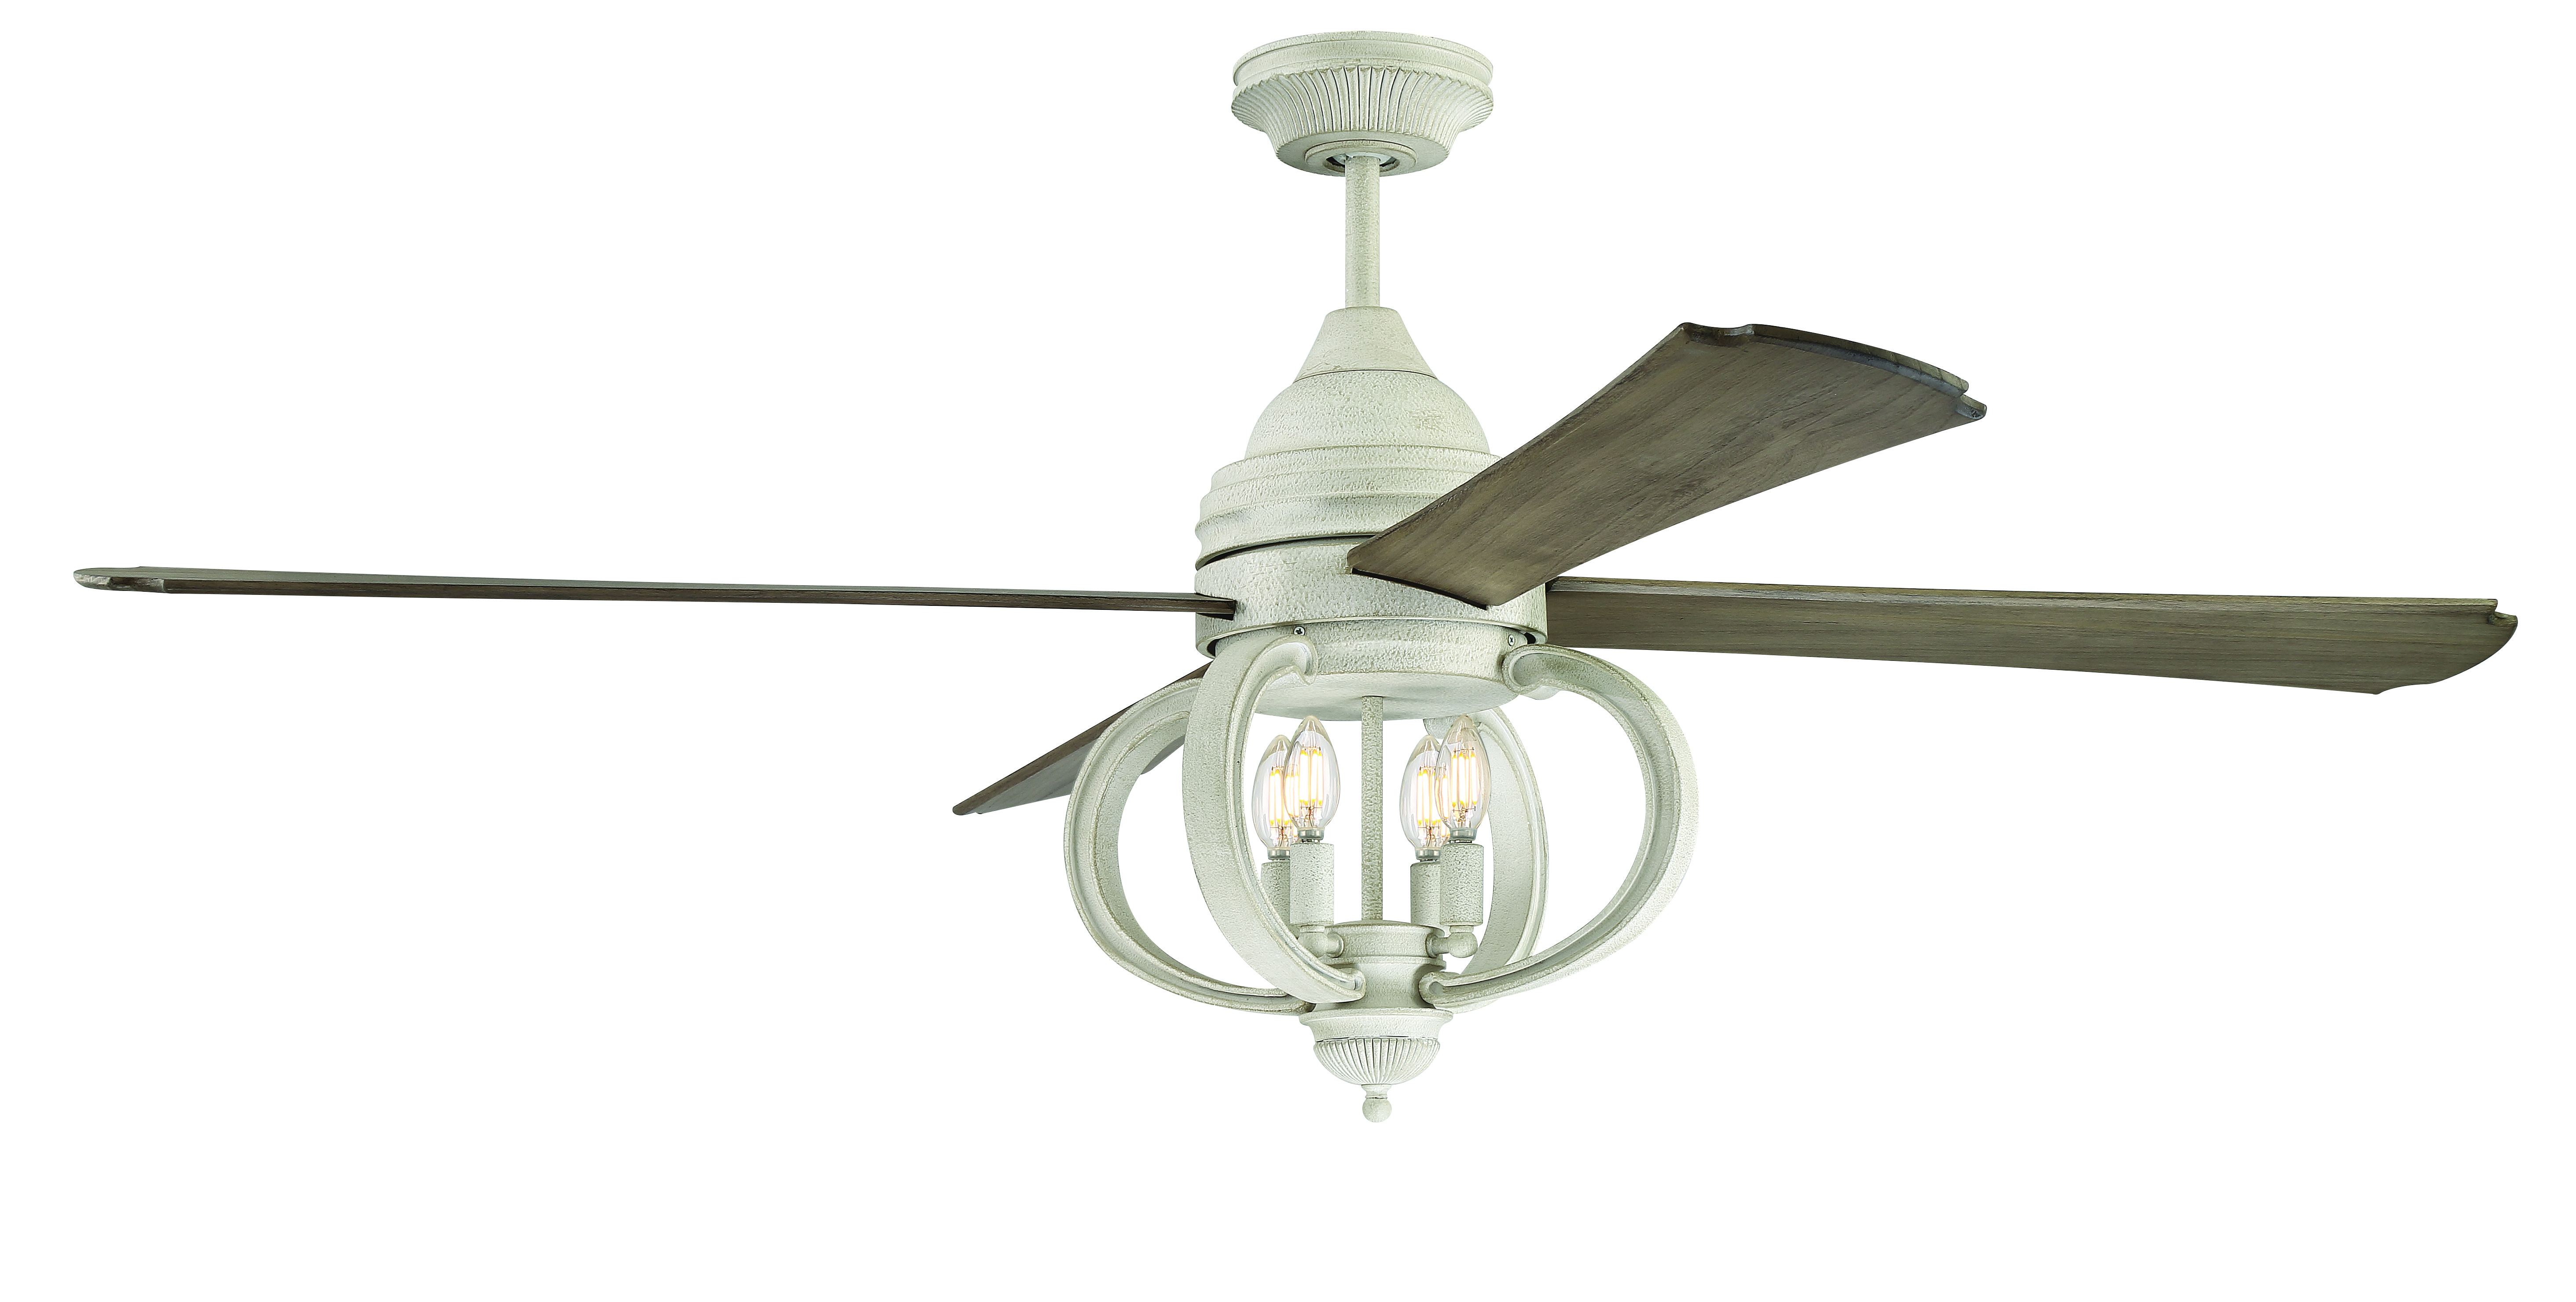 Craftmade Augusta ceiling fan